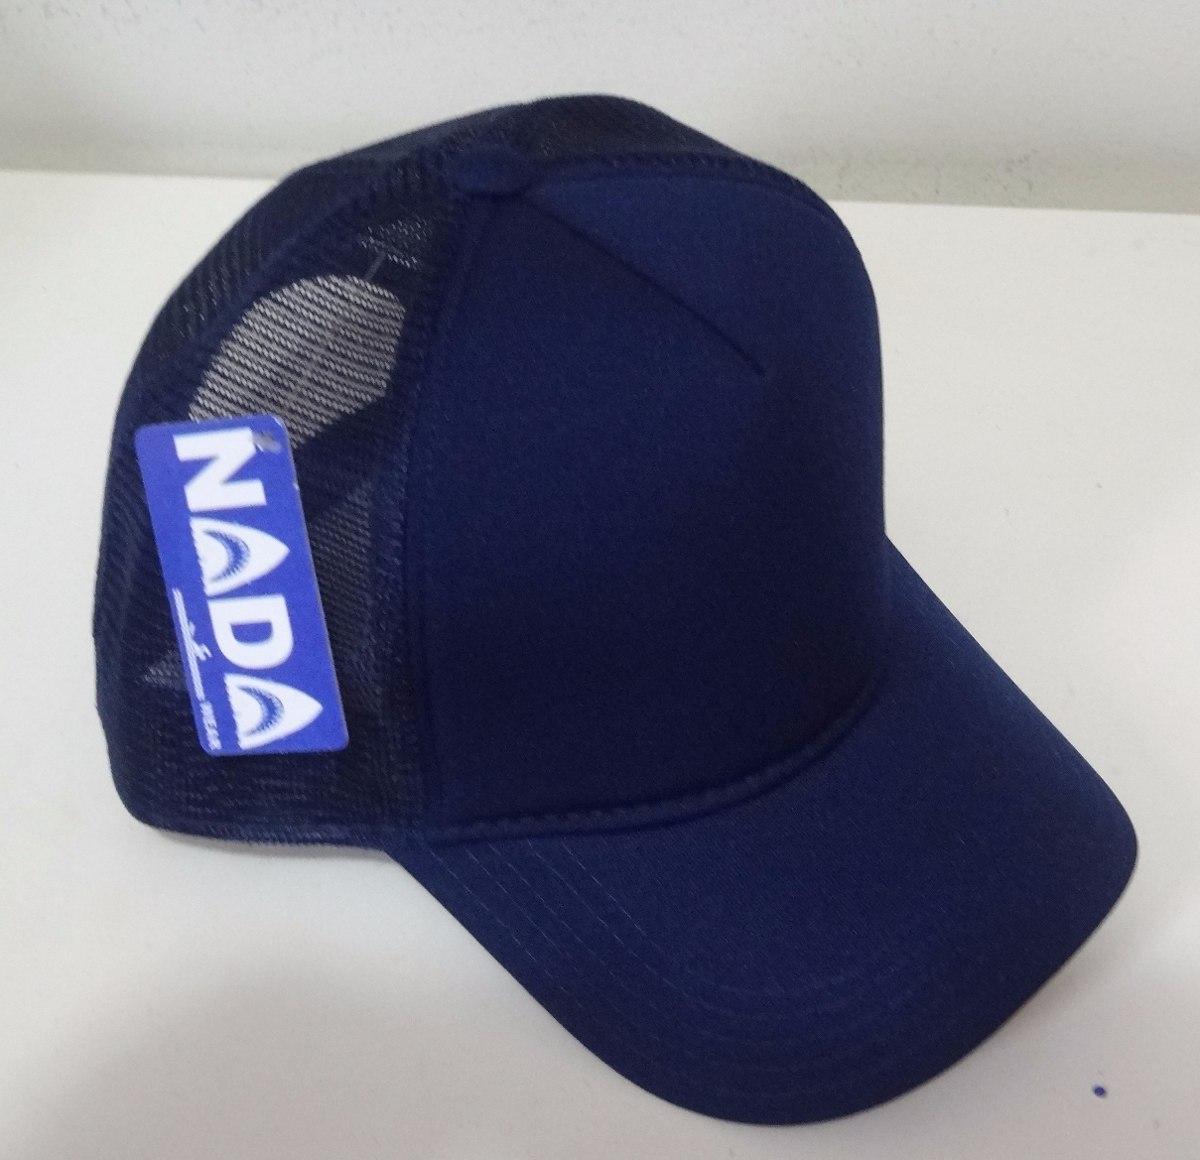 b3609417ab2e9 Boné Nada Wear Trucker Tela Cap Azul Marinho. - R  40